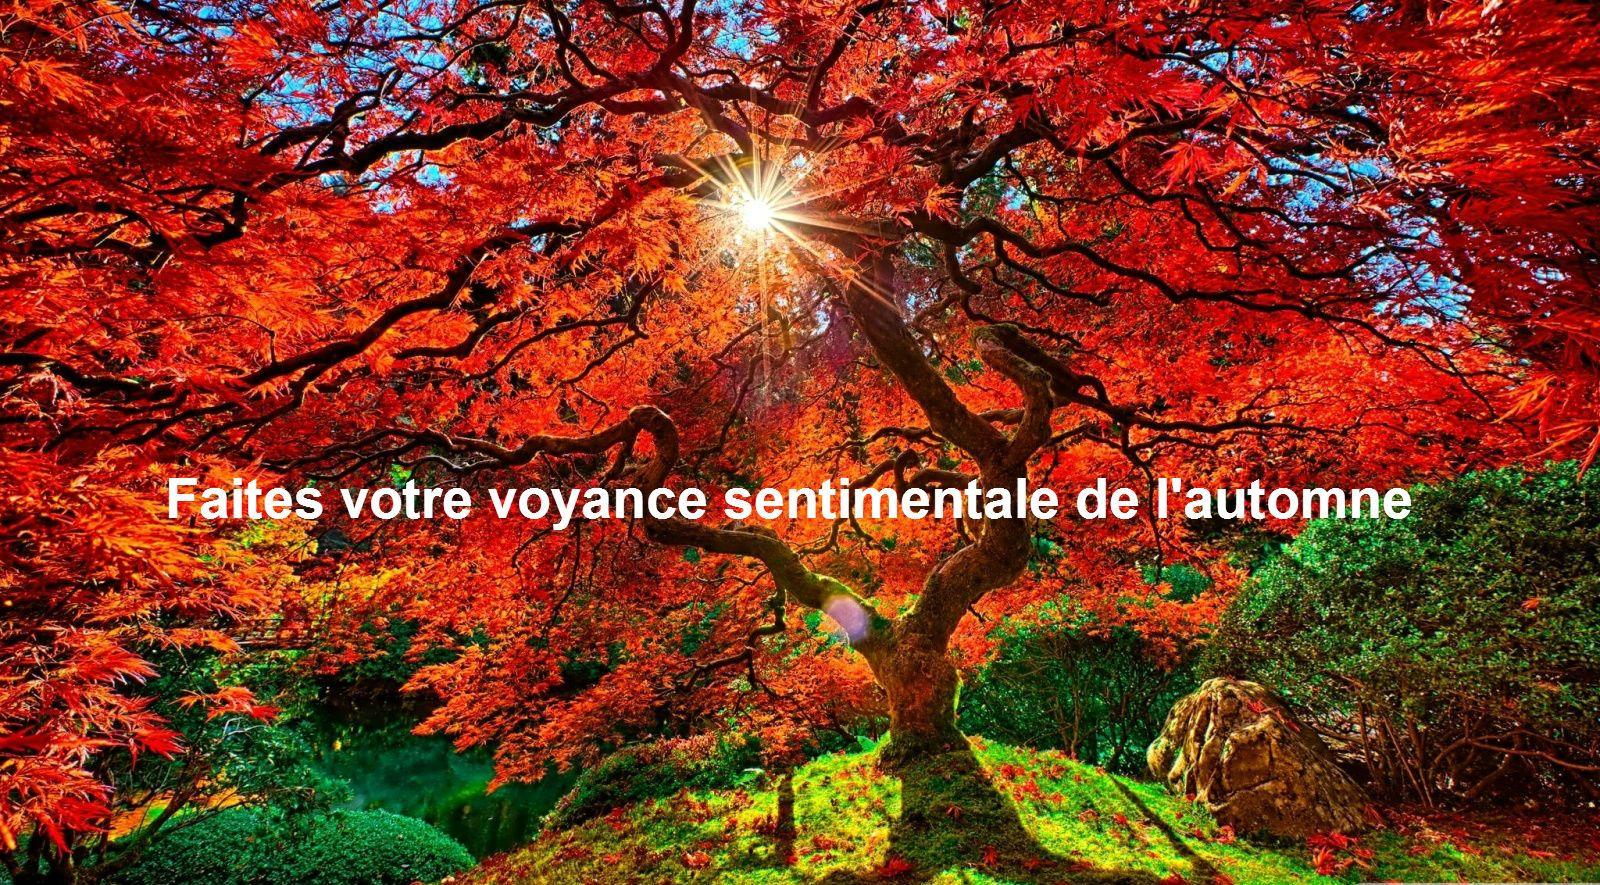 Voyance - ✨ Lutricia Voyance 08 99 37 00 68 ✨